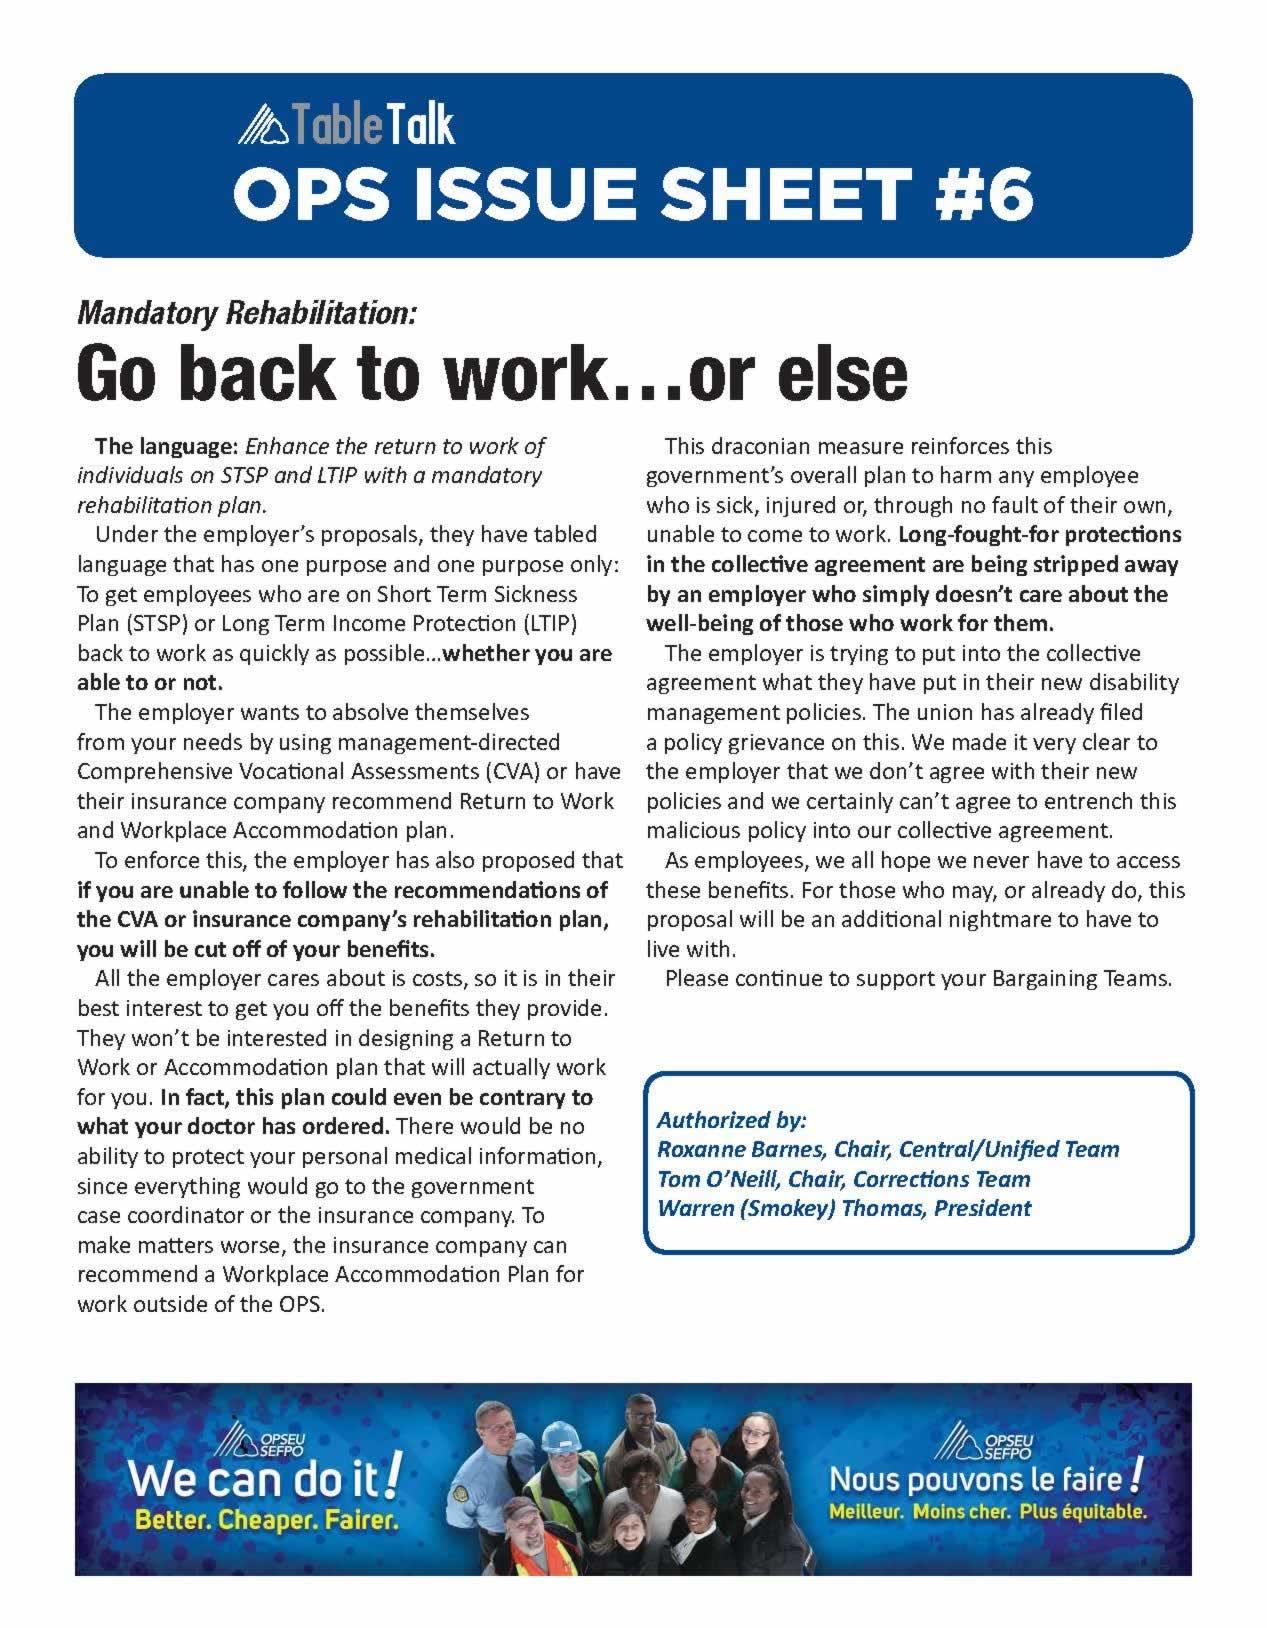 OPS Issue Sheet: Mandatory Rehabilitation: go back to work... or else